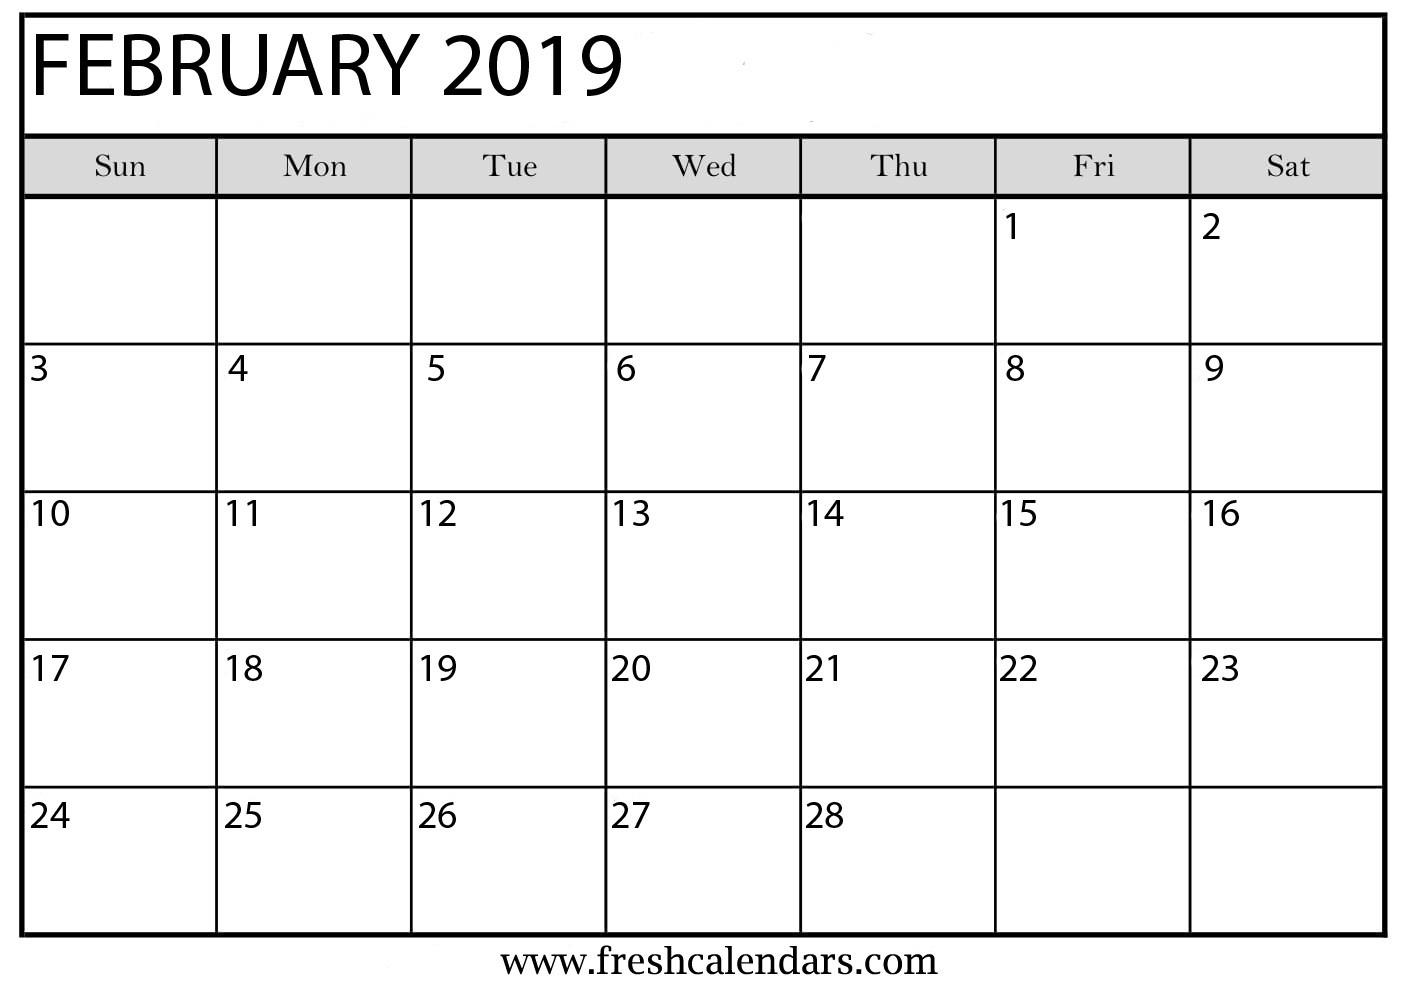 Blank February 2019 Calendar Printable Printable February 2019 Calendar Fresh Calendars